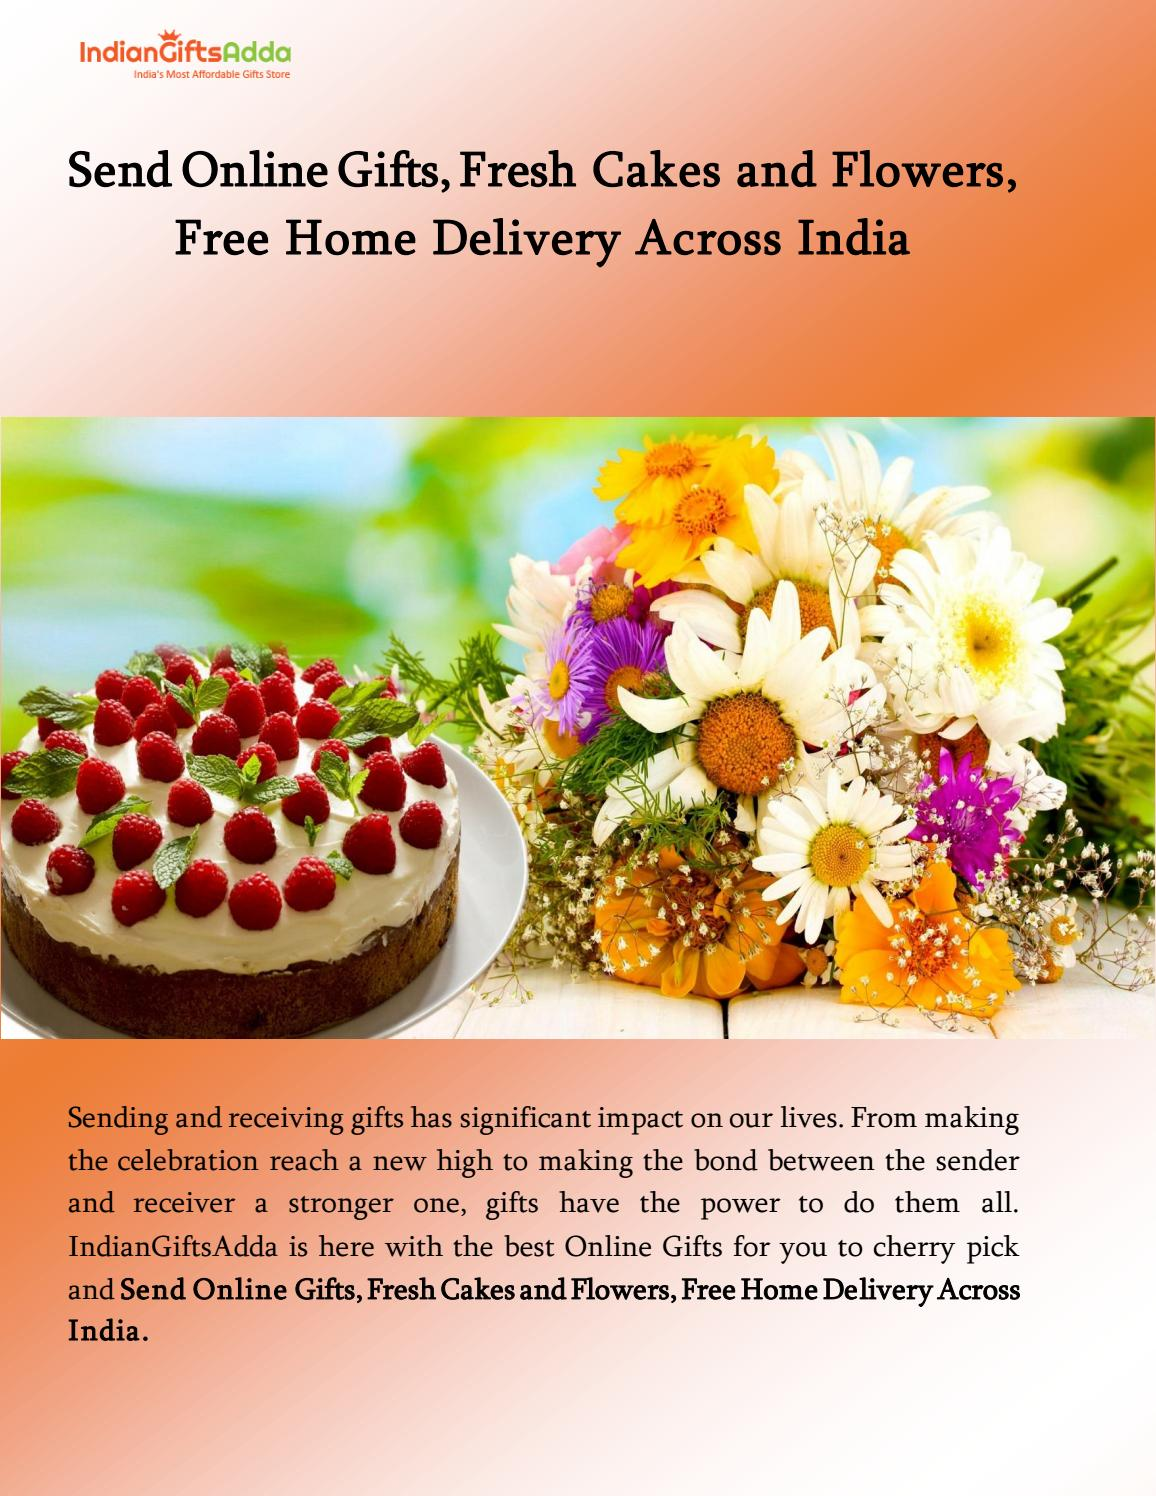 Send online gifts fresh cakes and flowers free home delivery send online gifts fresh cakes and flowers free home delivery across india by indiangifts adda issuu izmirmasajfo